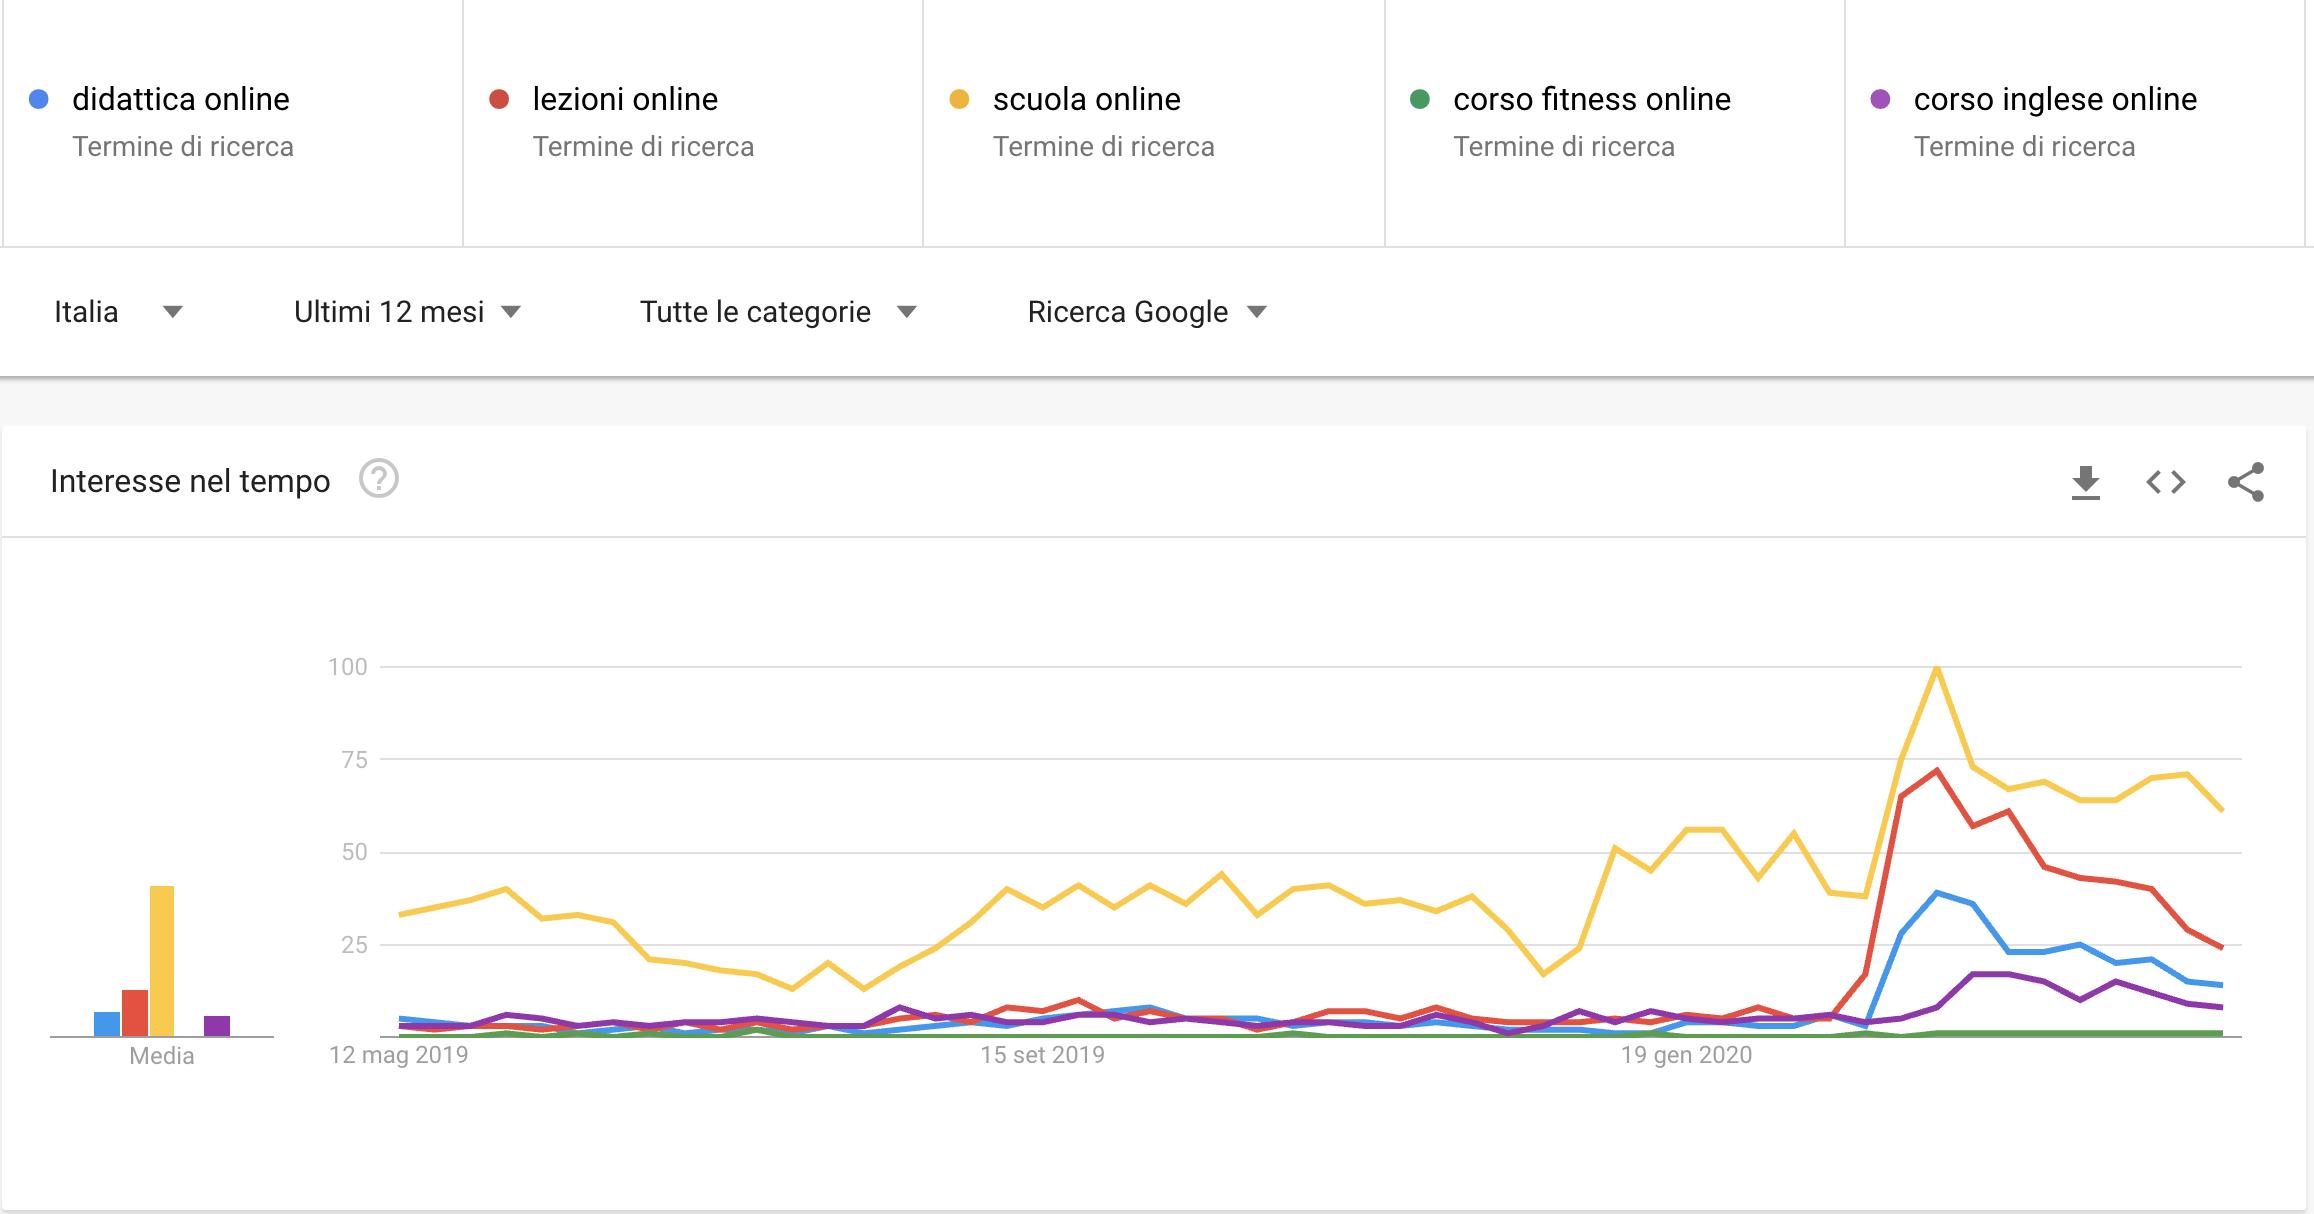 Trend per la Didattica online